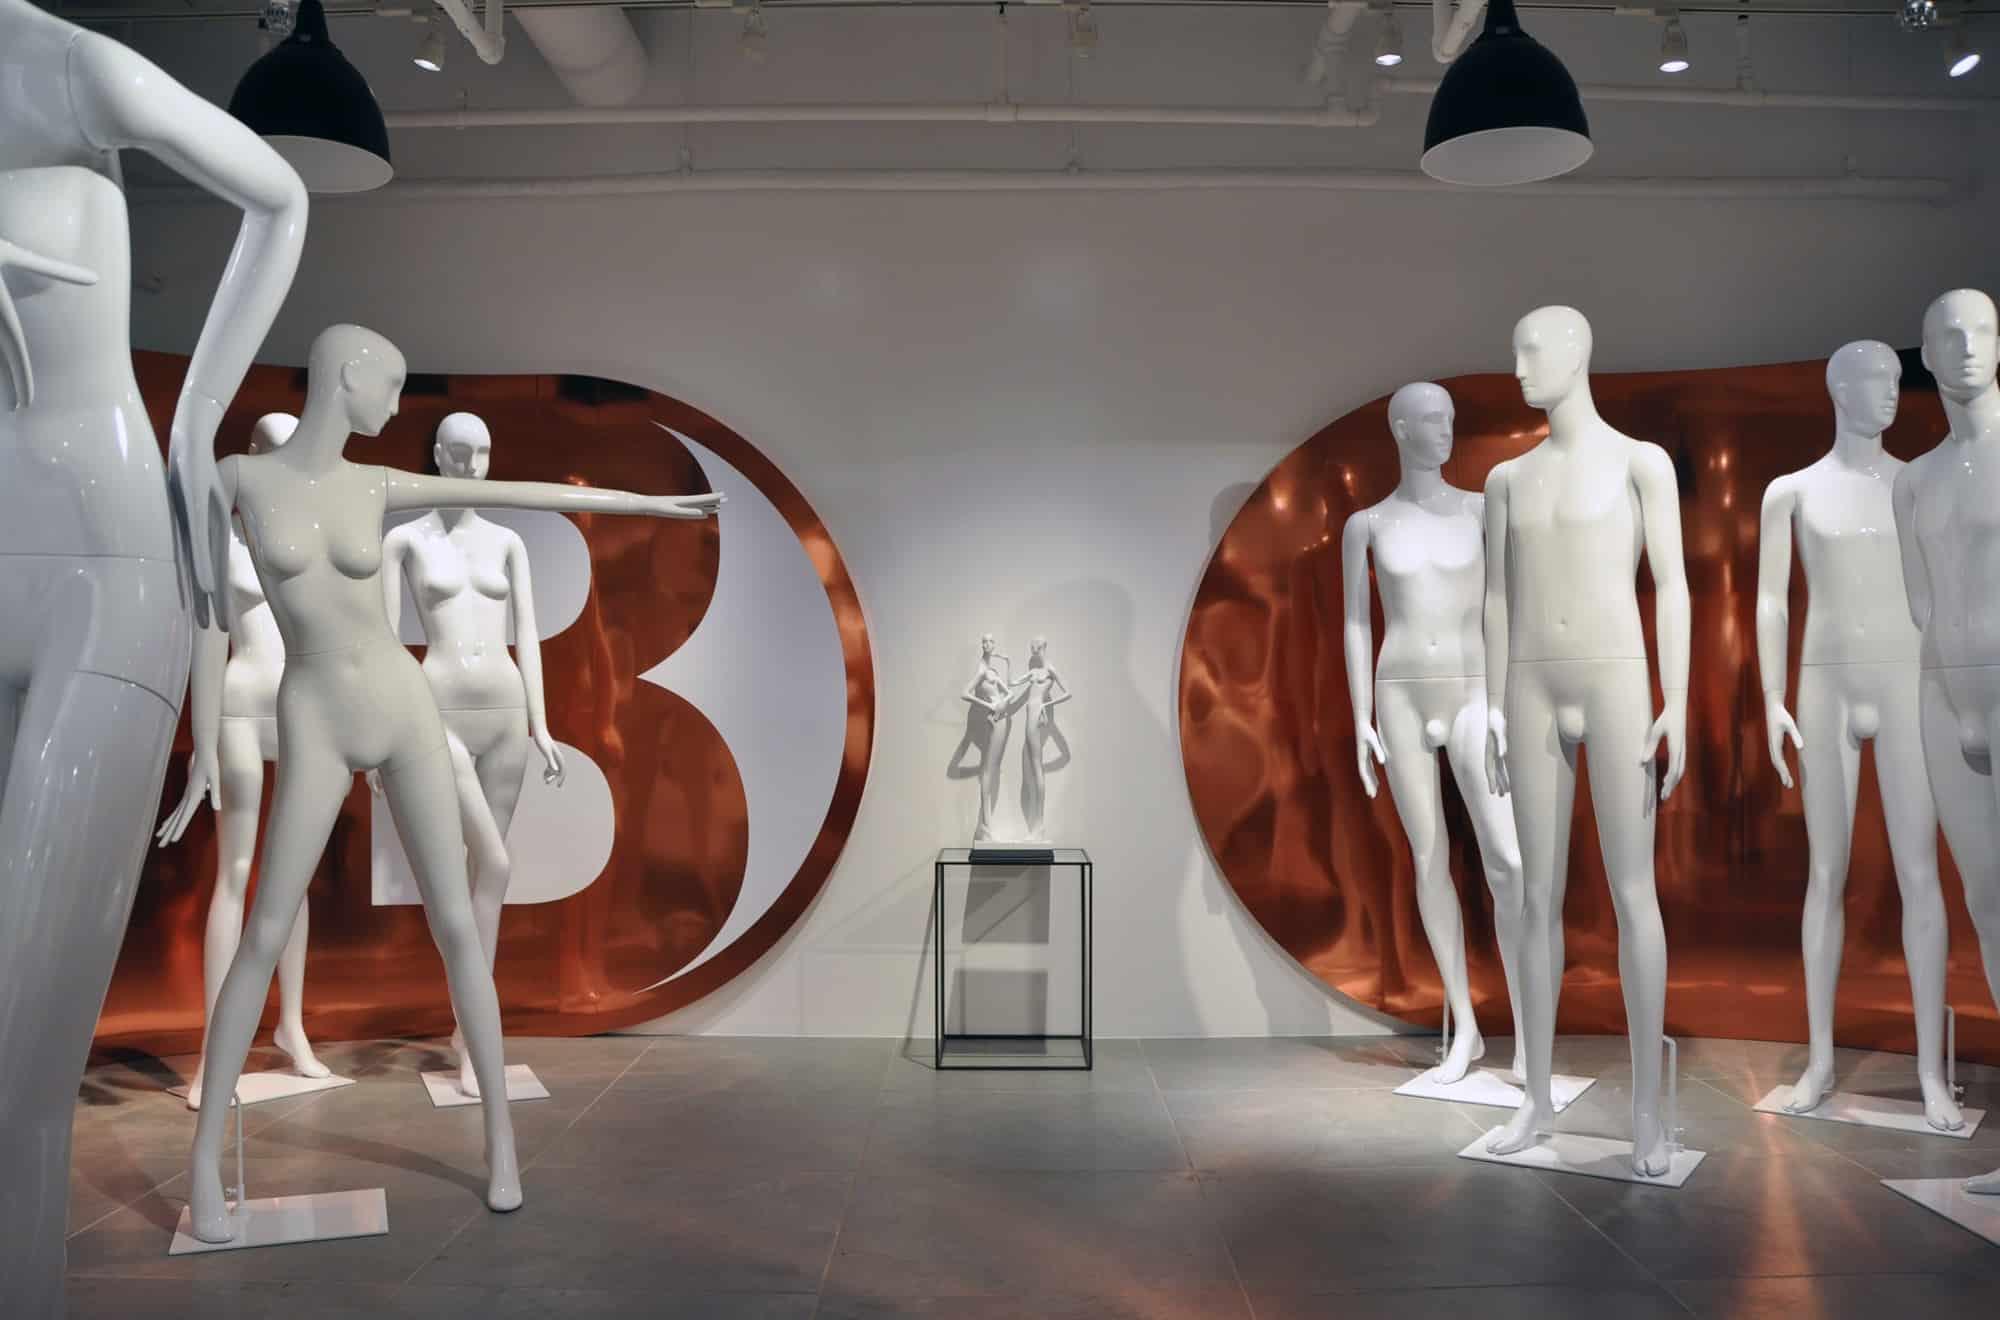 bonaveri mannequin exhibition tokyo japan 08